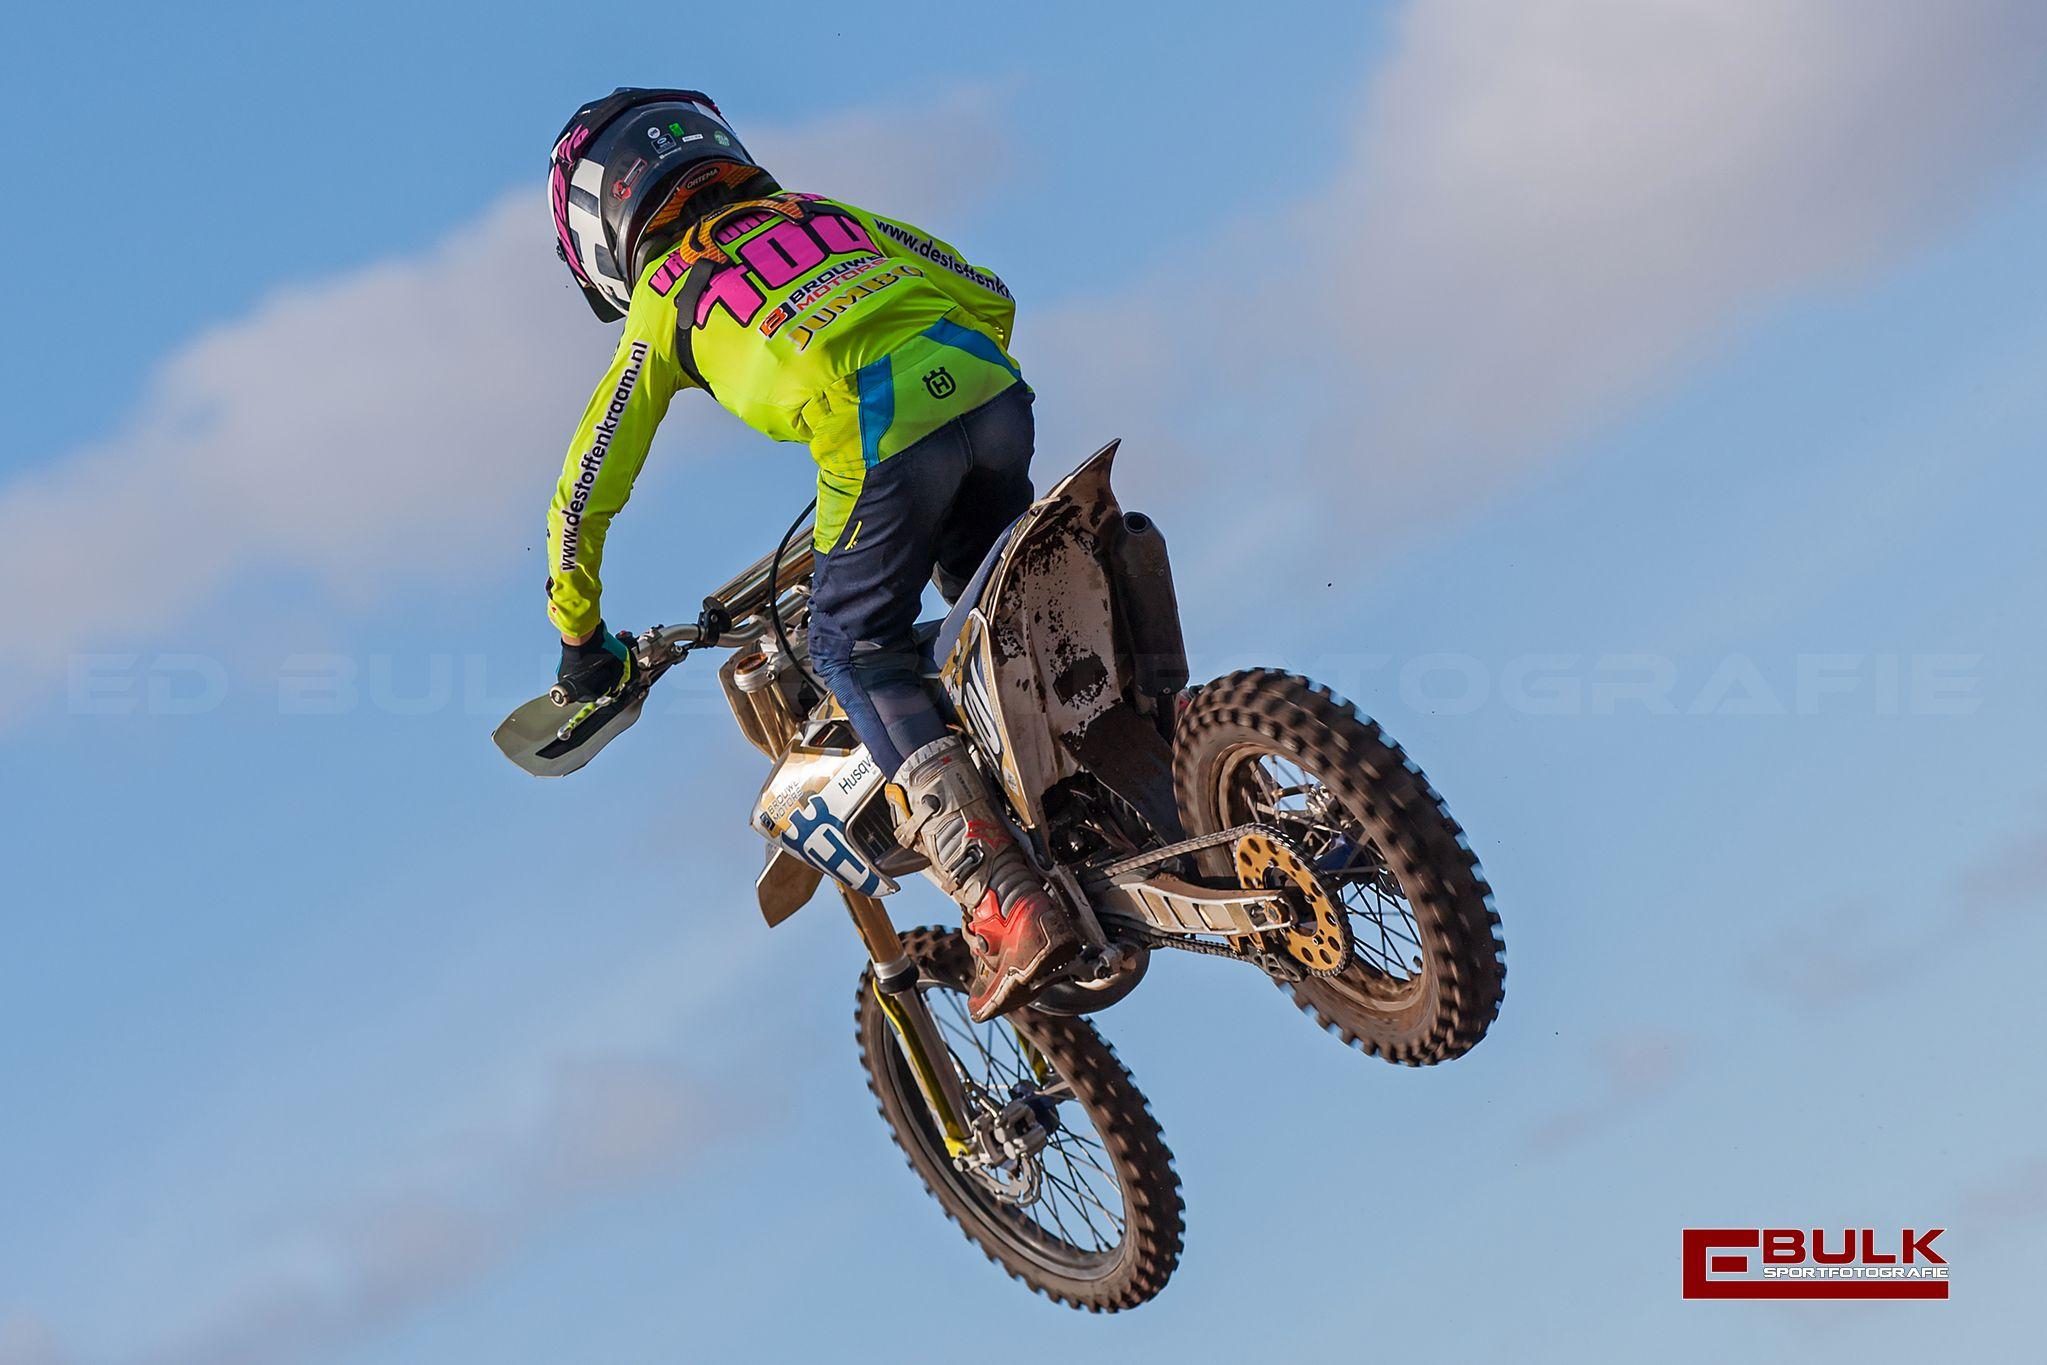 ebs_1009-ed_bulk_sportfotografie